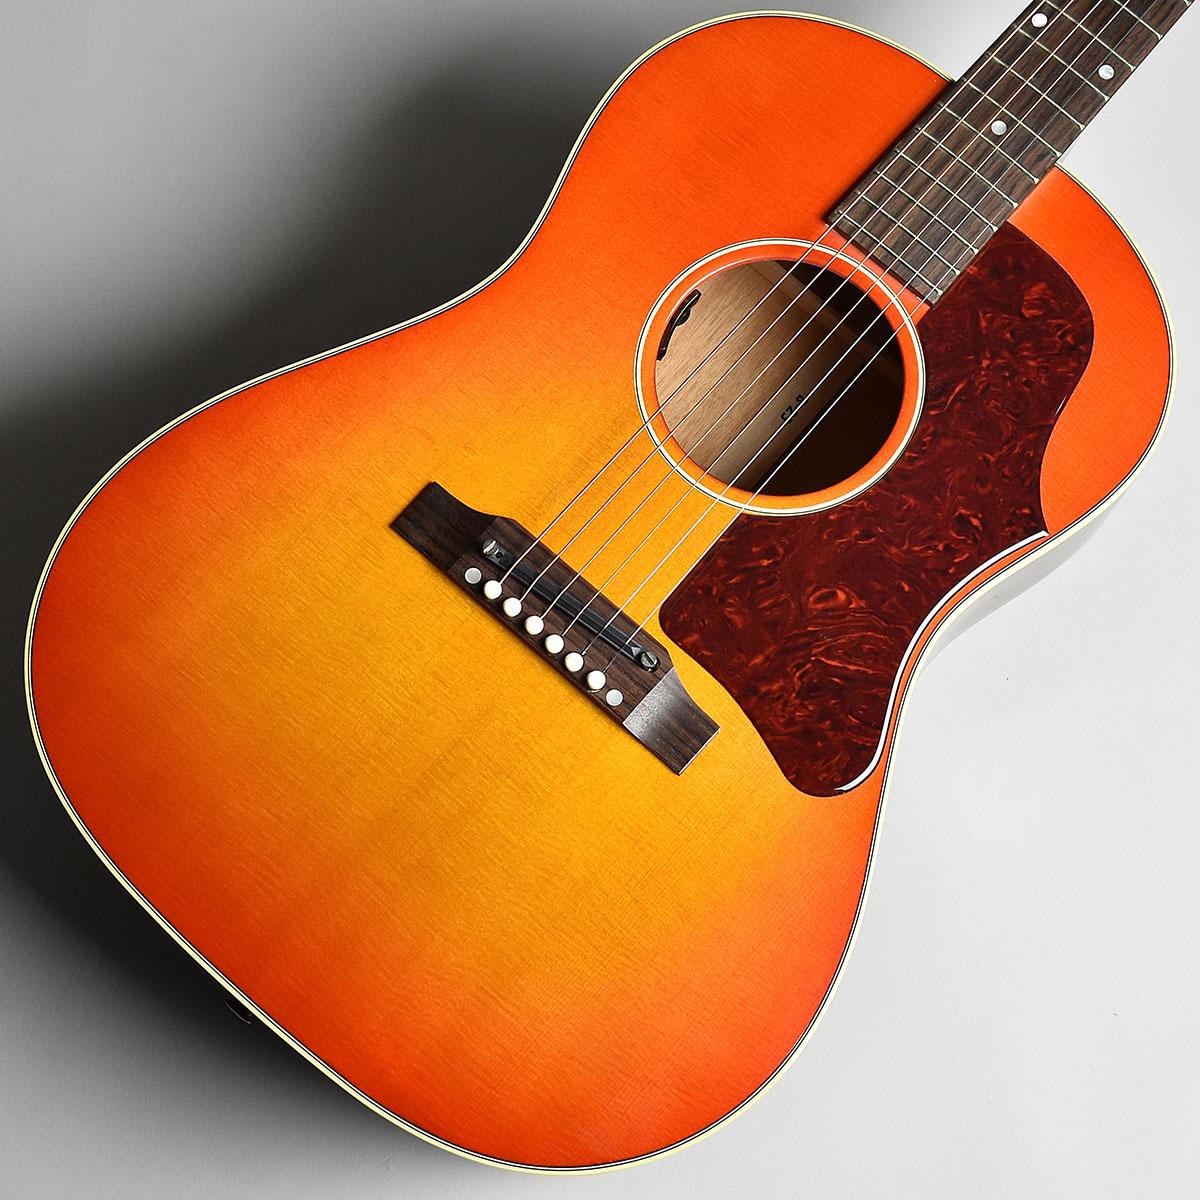 Gibson 1960's B-25 w/Lyric 2018 Limited Cherry Sunburst S/N:10580007 エレアコ 【ギブソン B25】【未展示品】